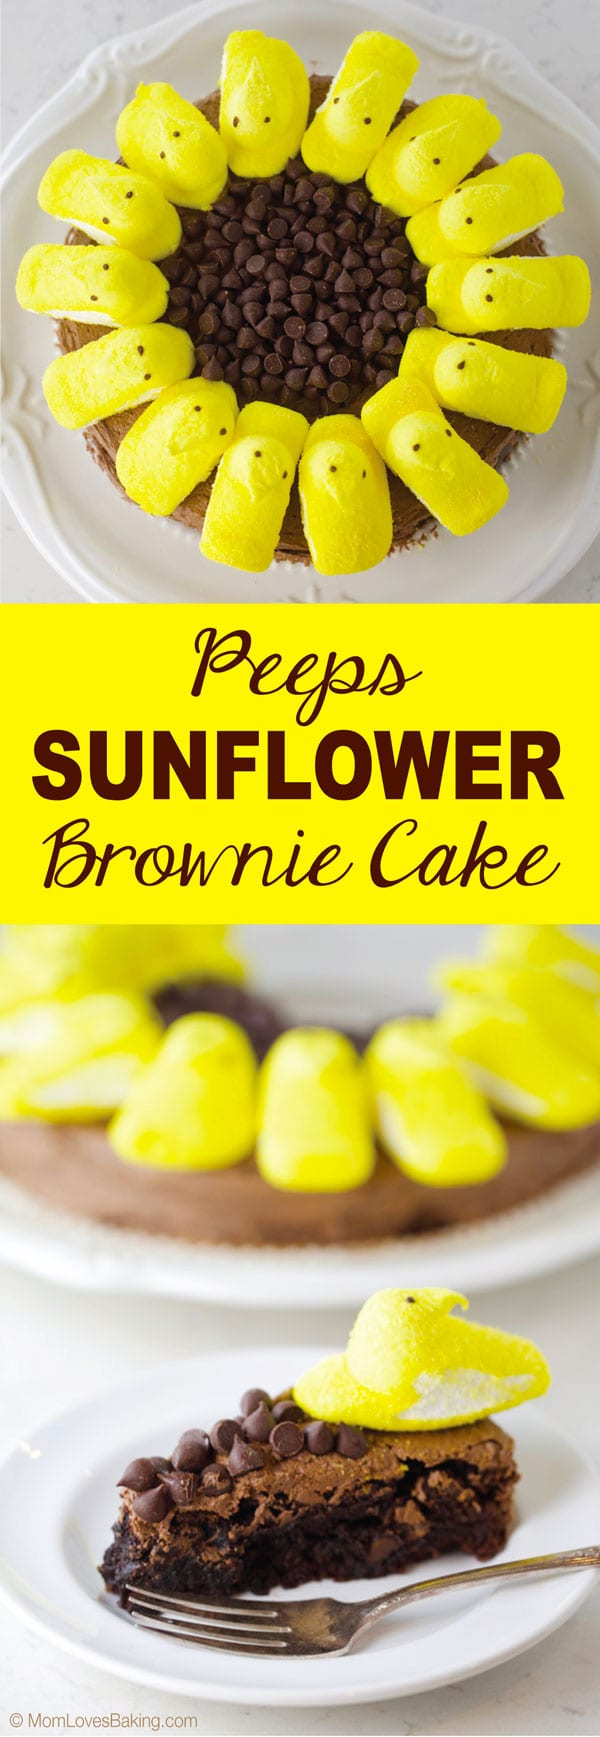 Adorable yellow peeps sunflower brownie cake